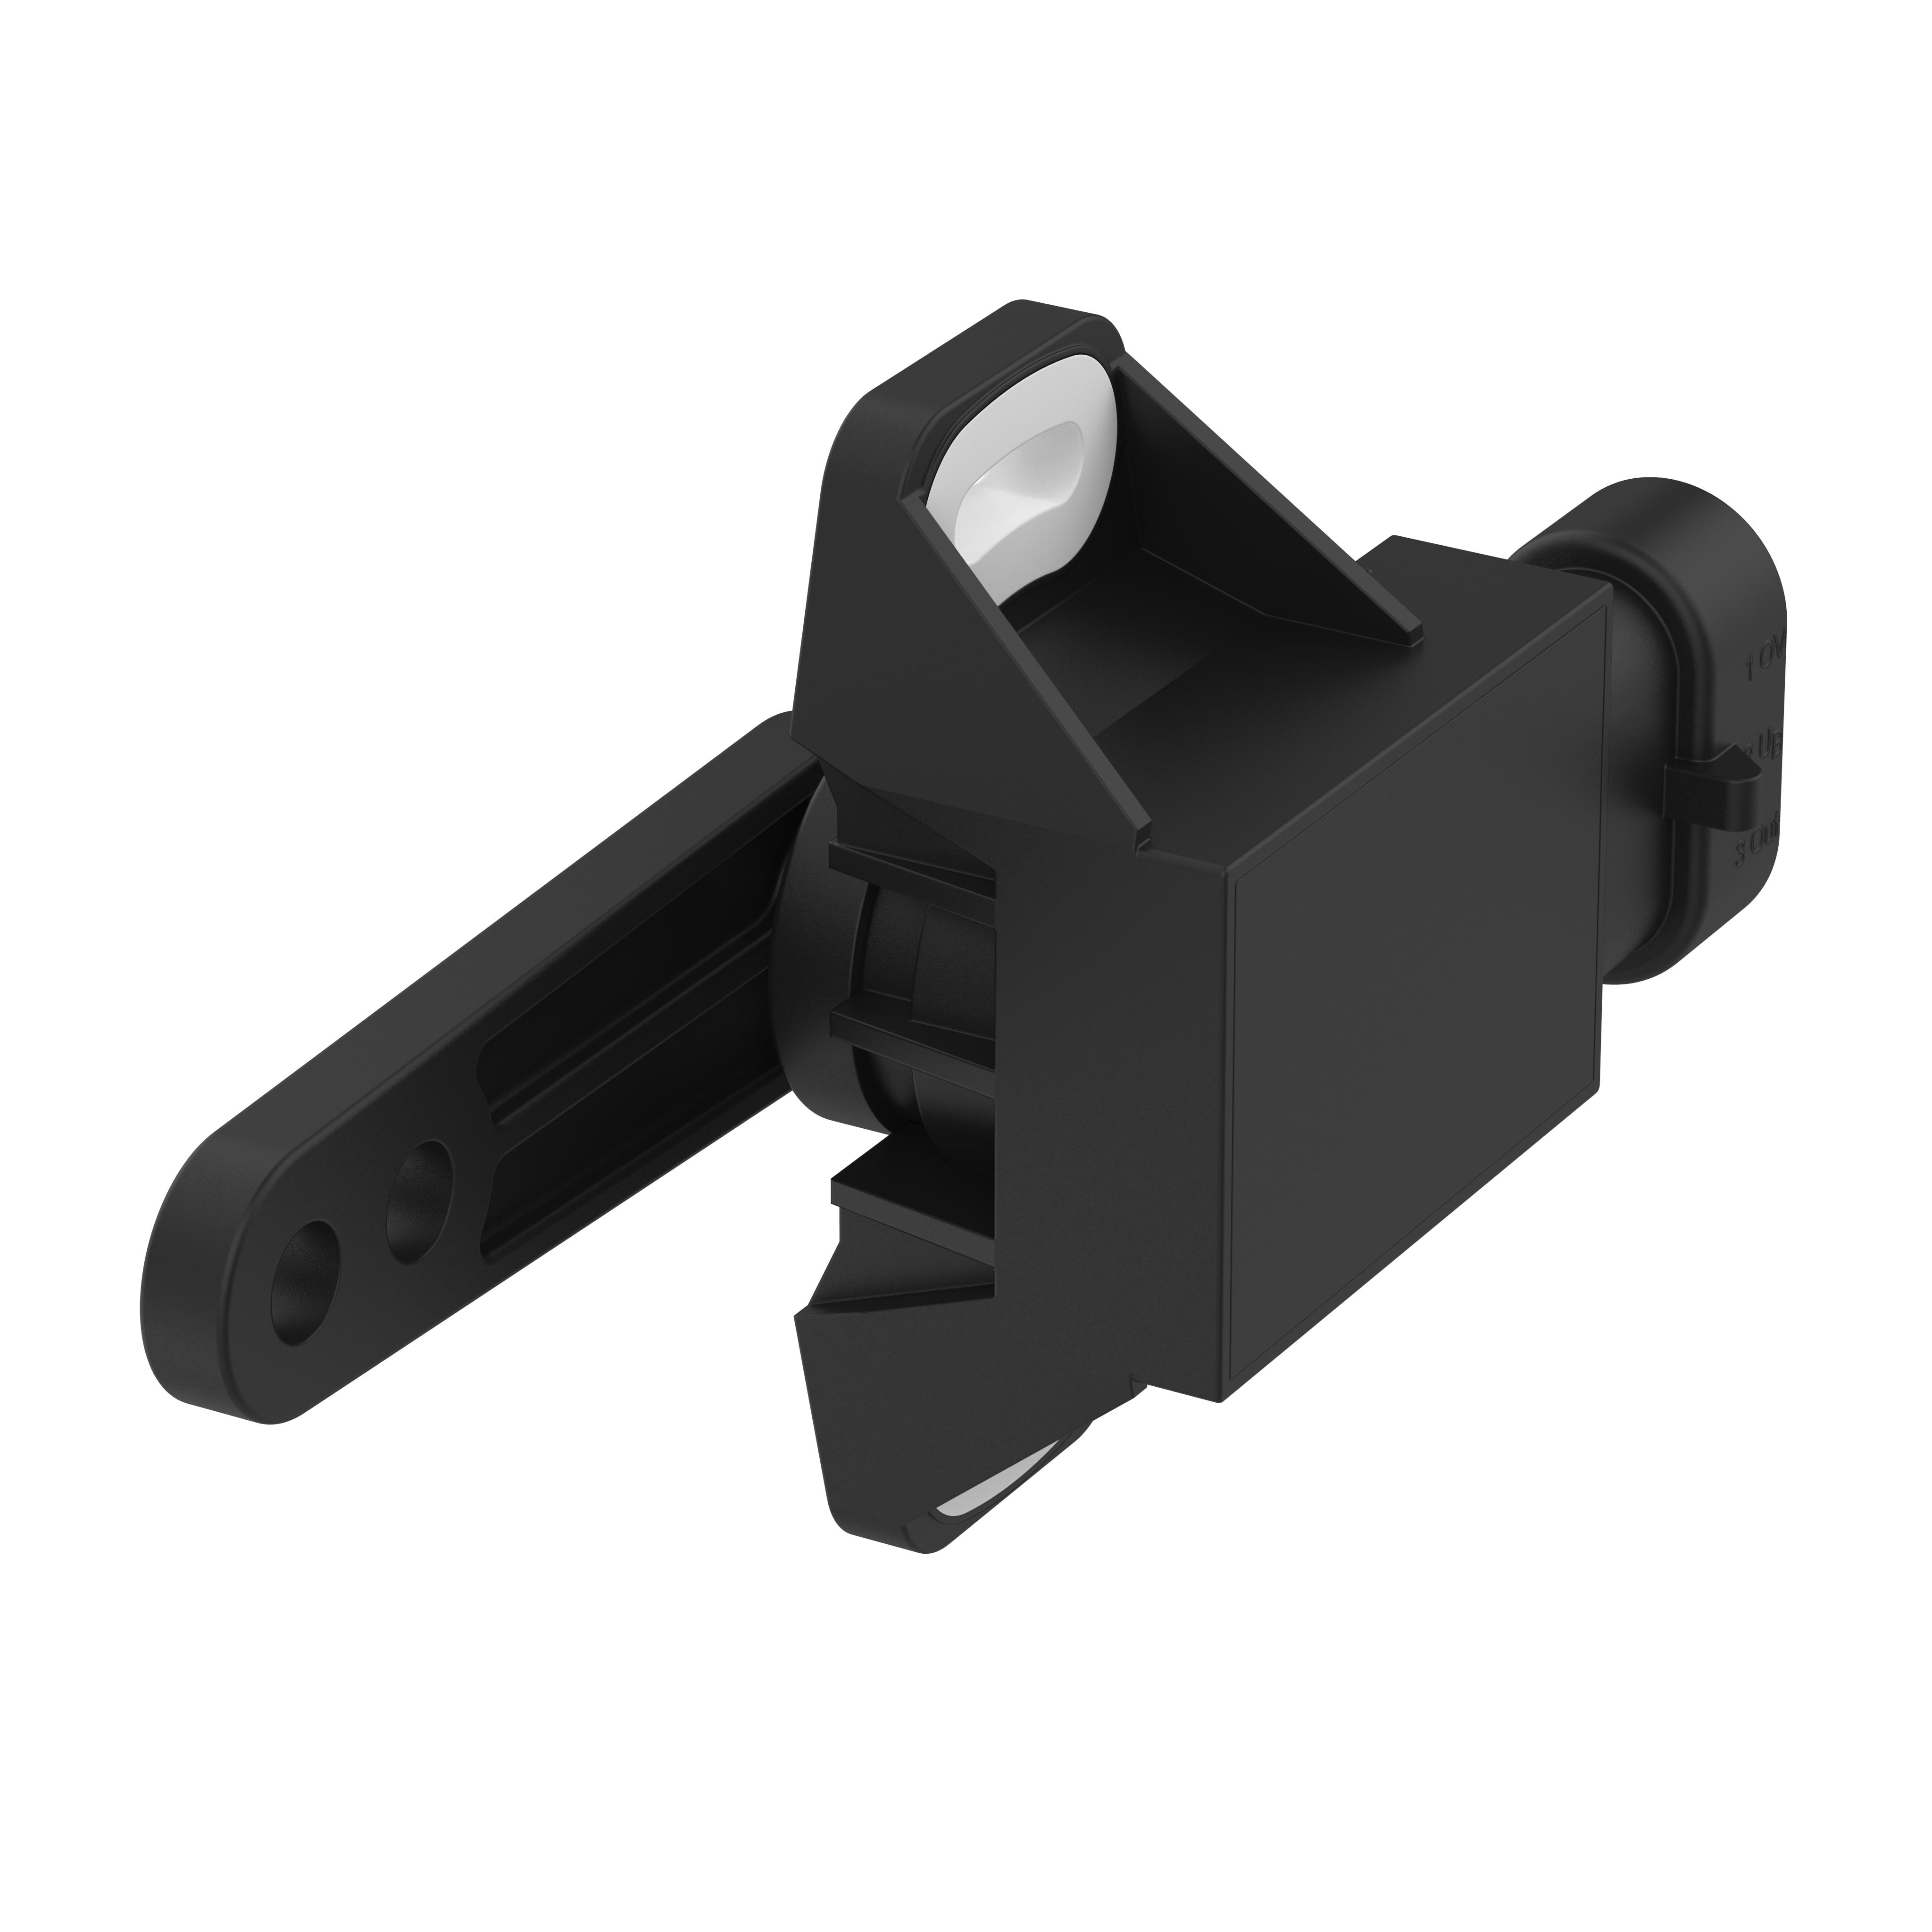 Winkelsensor 090° CCW - 424A17A090 - 0,5-4,5V